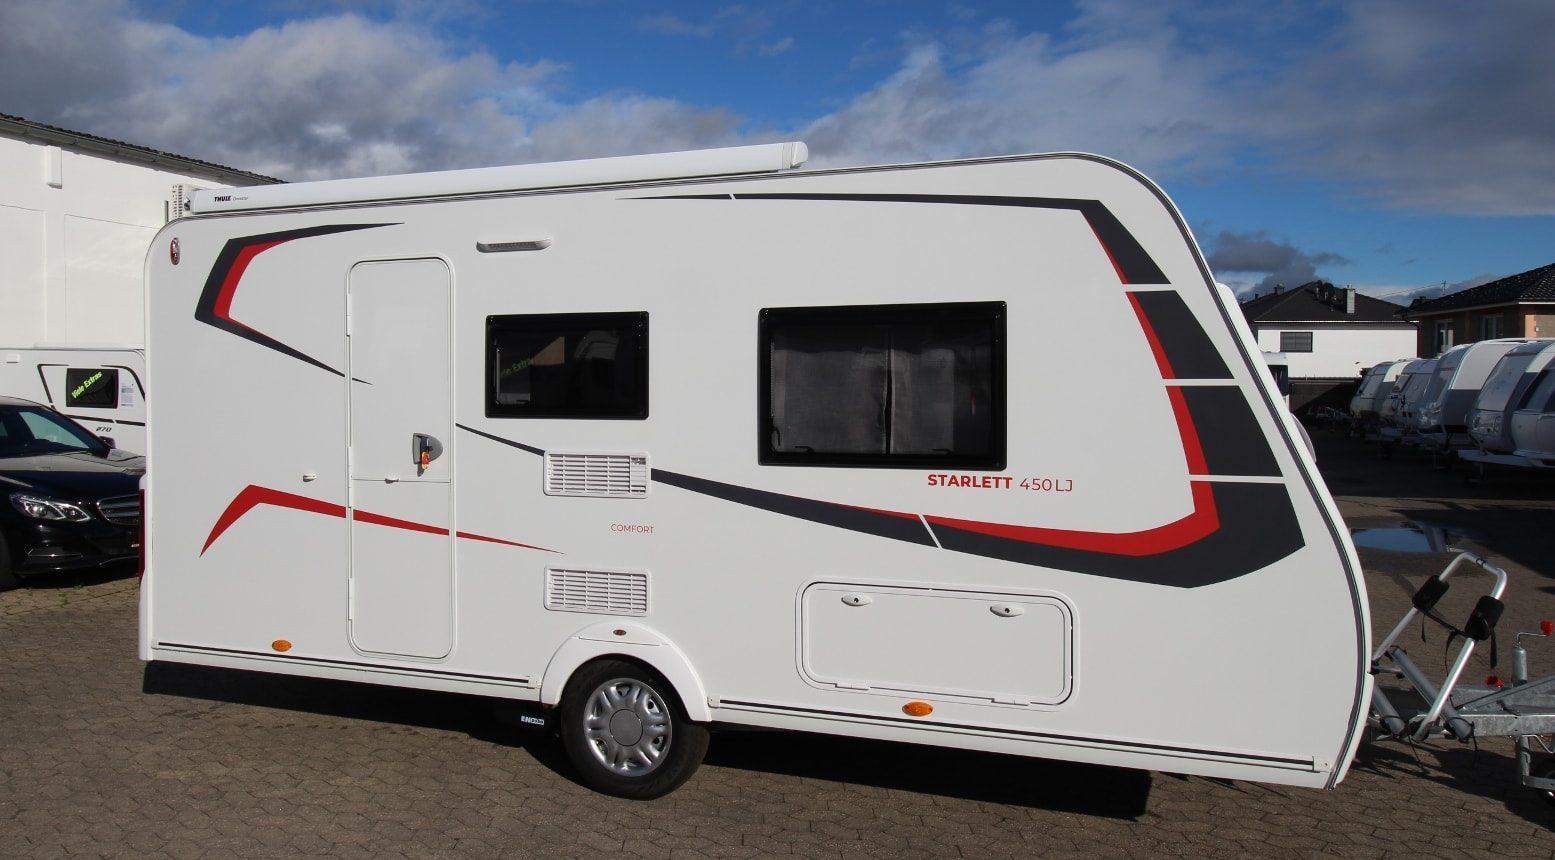 Sterckeman 450LJ Starlett Comfort 2020 – Außenansicht